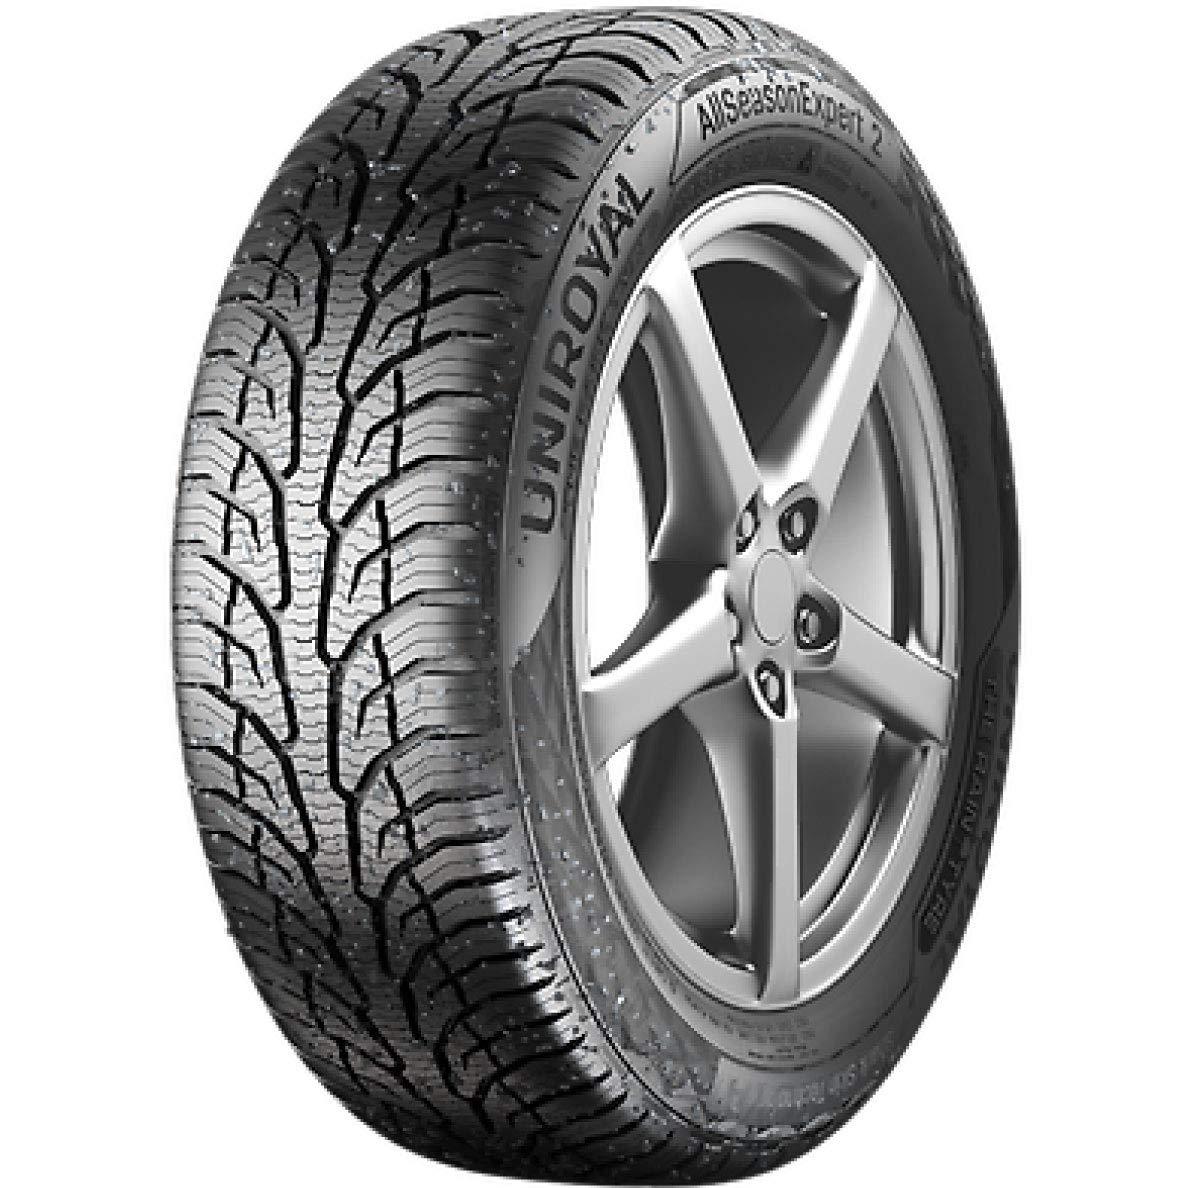 Gomme Uniroyal Allseasonexpert 2 205 55 R16 91H TL 4 stagioni per Auto